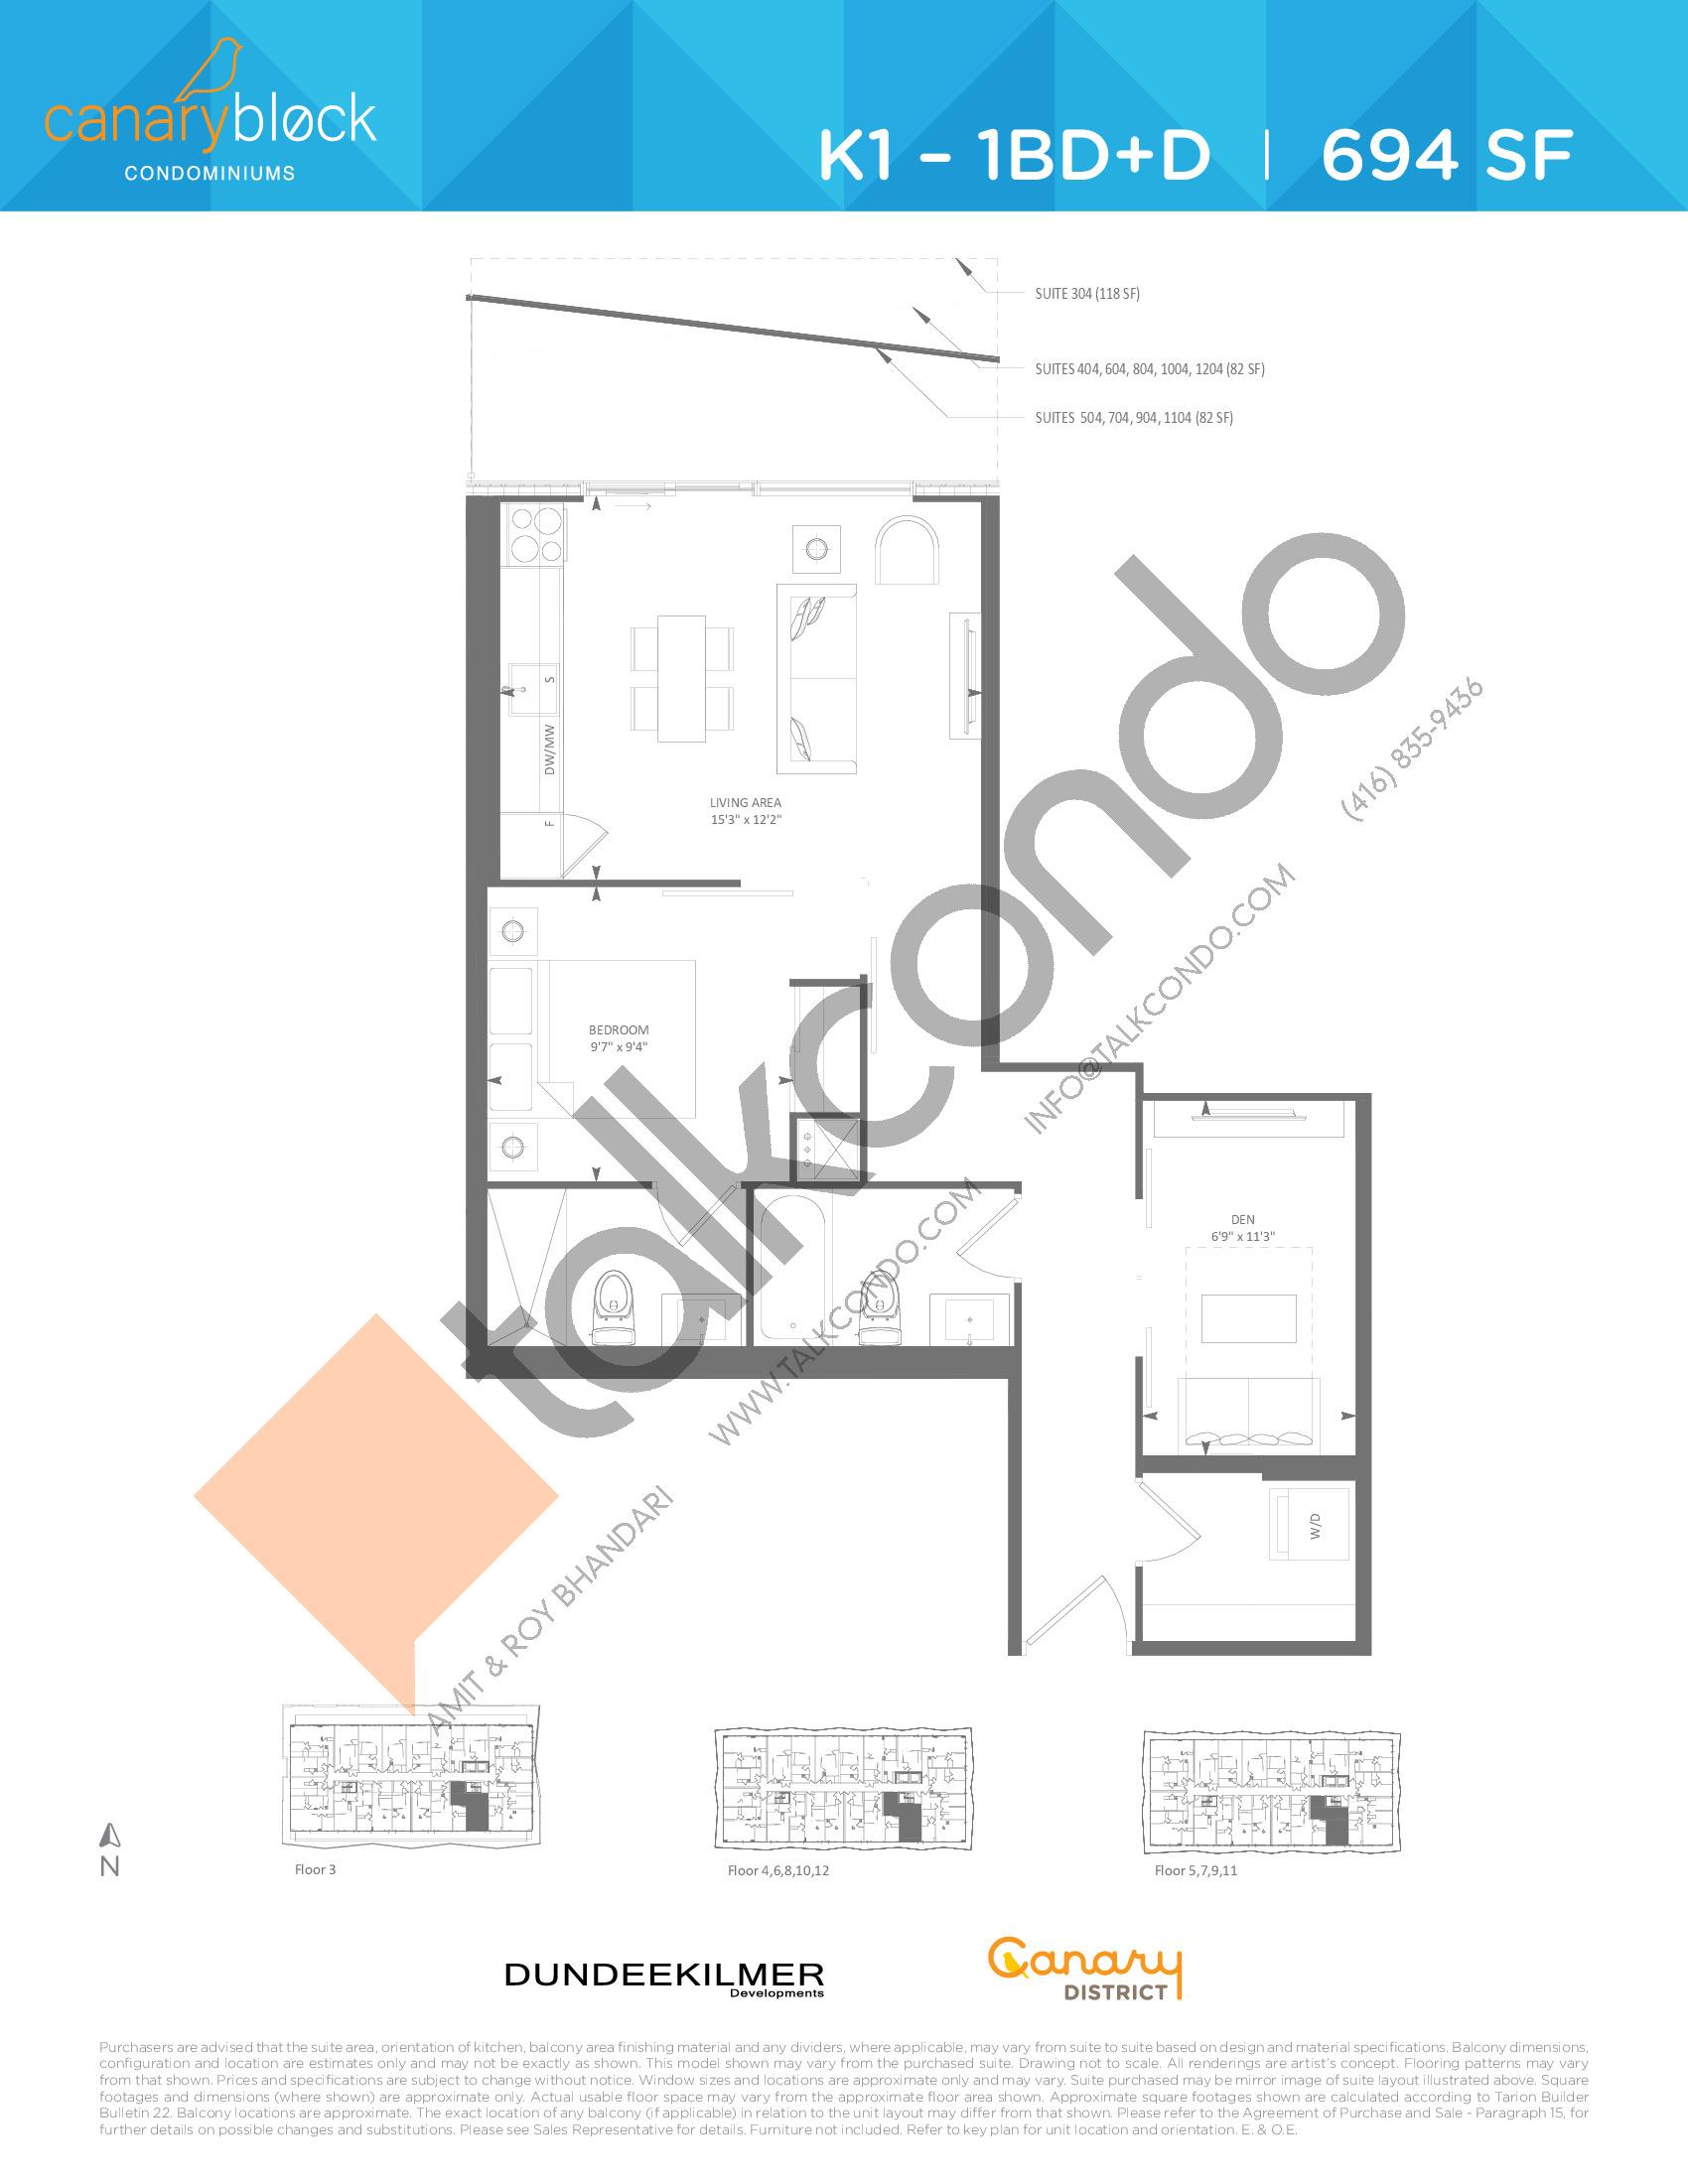 K1 - 1BD+D Floor Plan at Canary Block Condos - 694 sq.ft